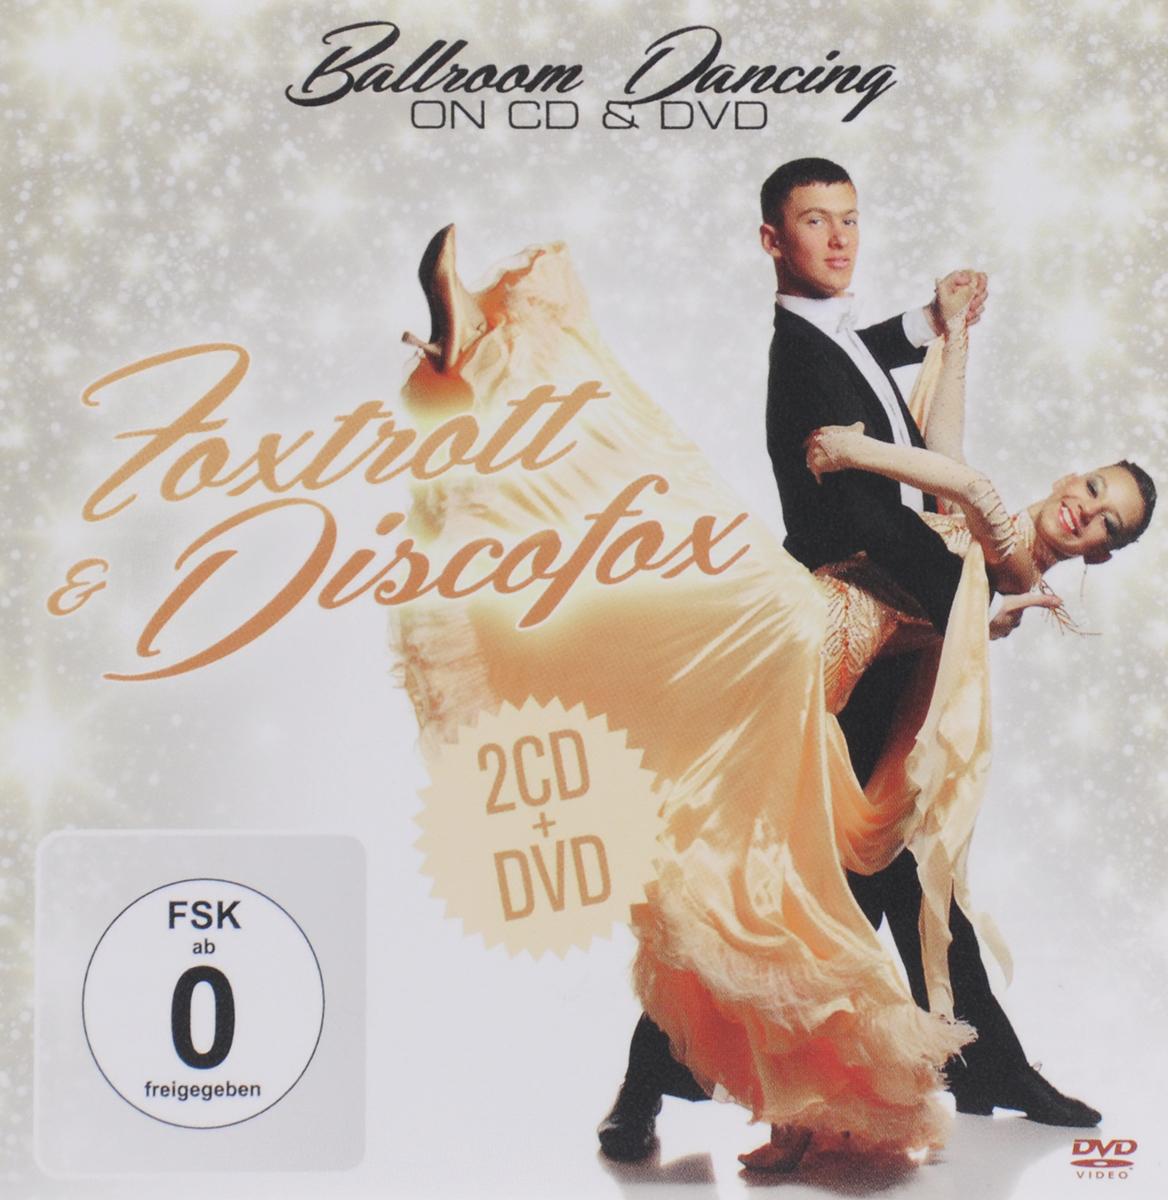 Ballroom Dancing. Foxtrott & Discofox (2 CD + DVD)